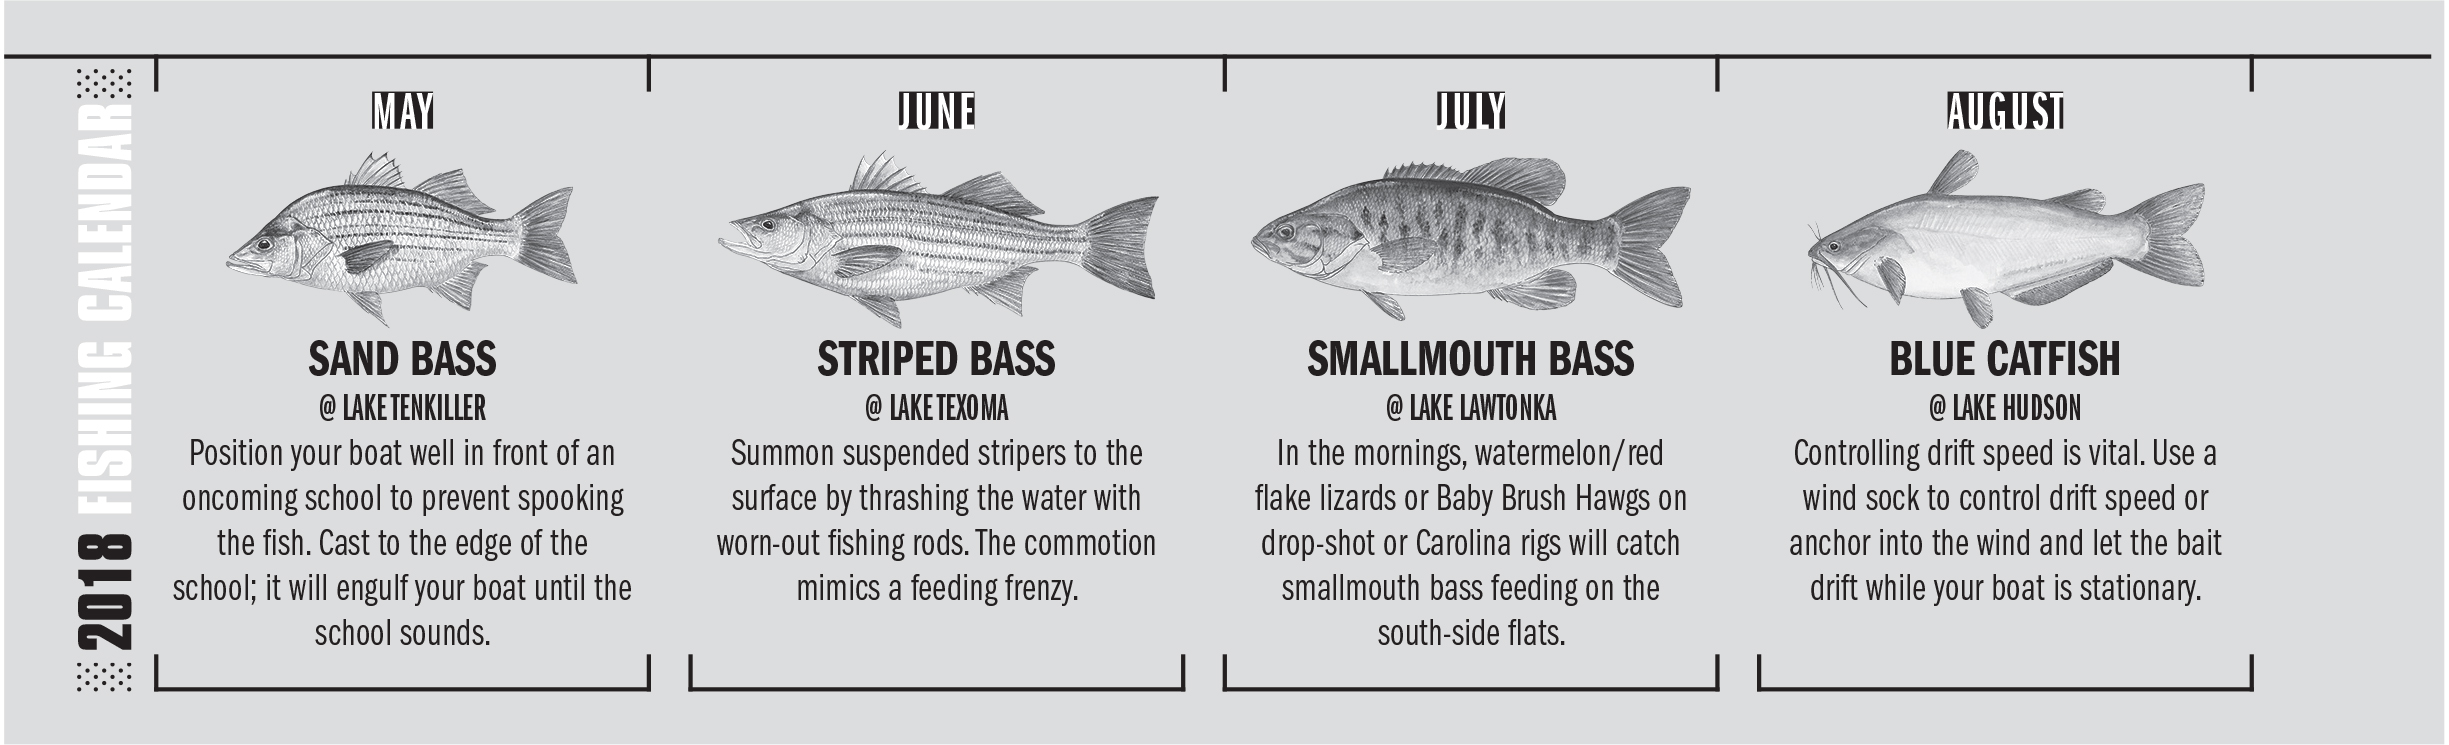 2018 oklahoma fishing calendar game fish for Fishing in oklahoma